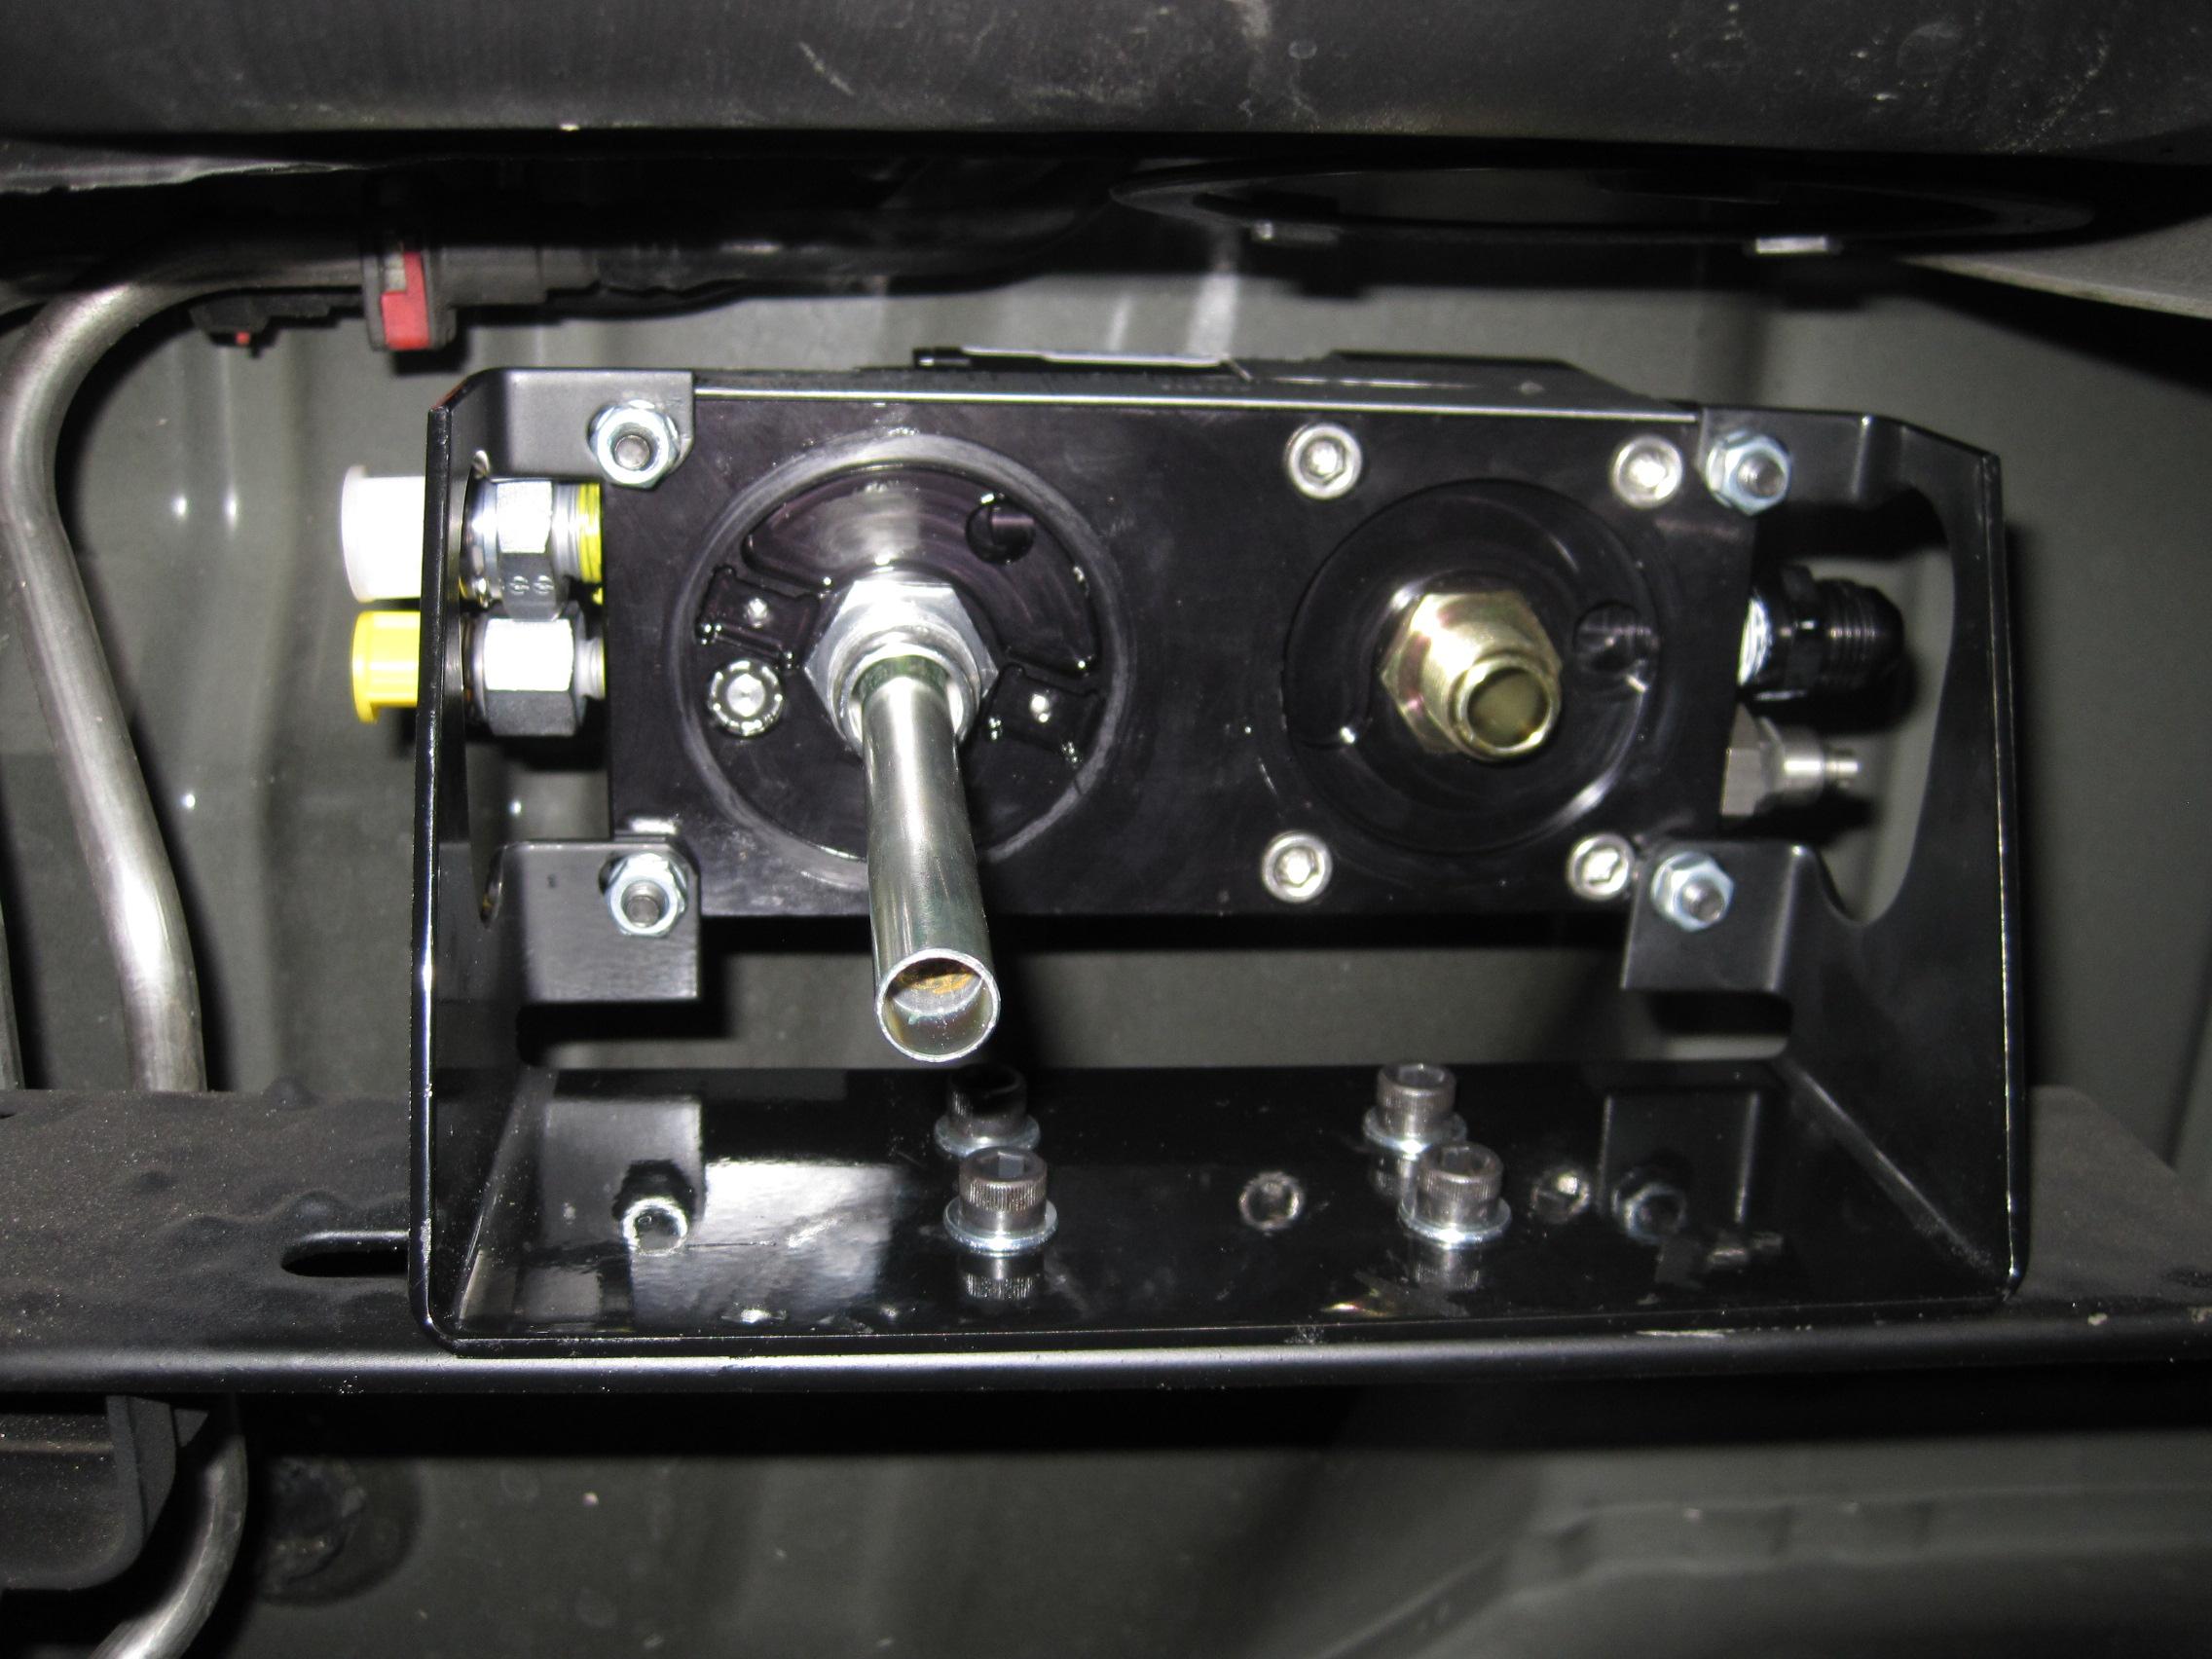 AirDog II 165 Install - Chevy and GMC Duramax Diesel Forum